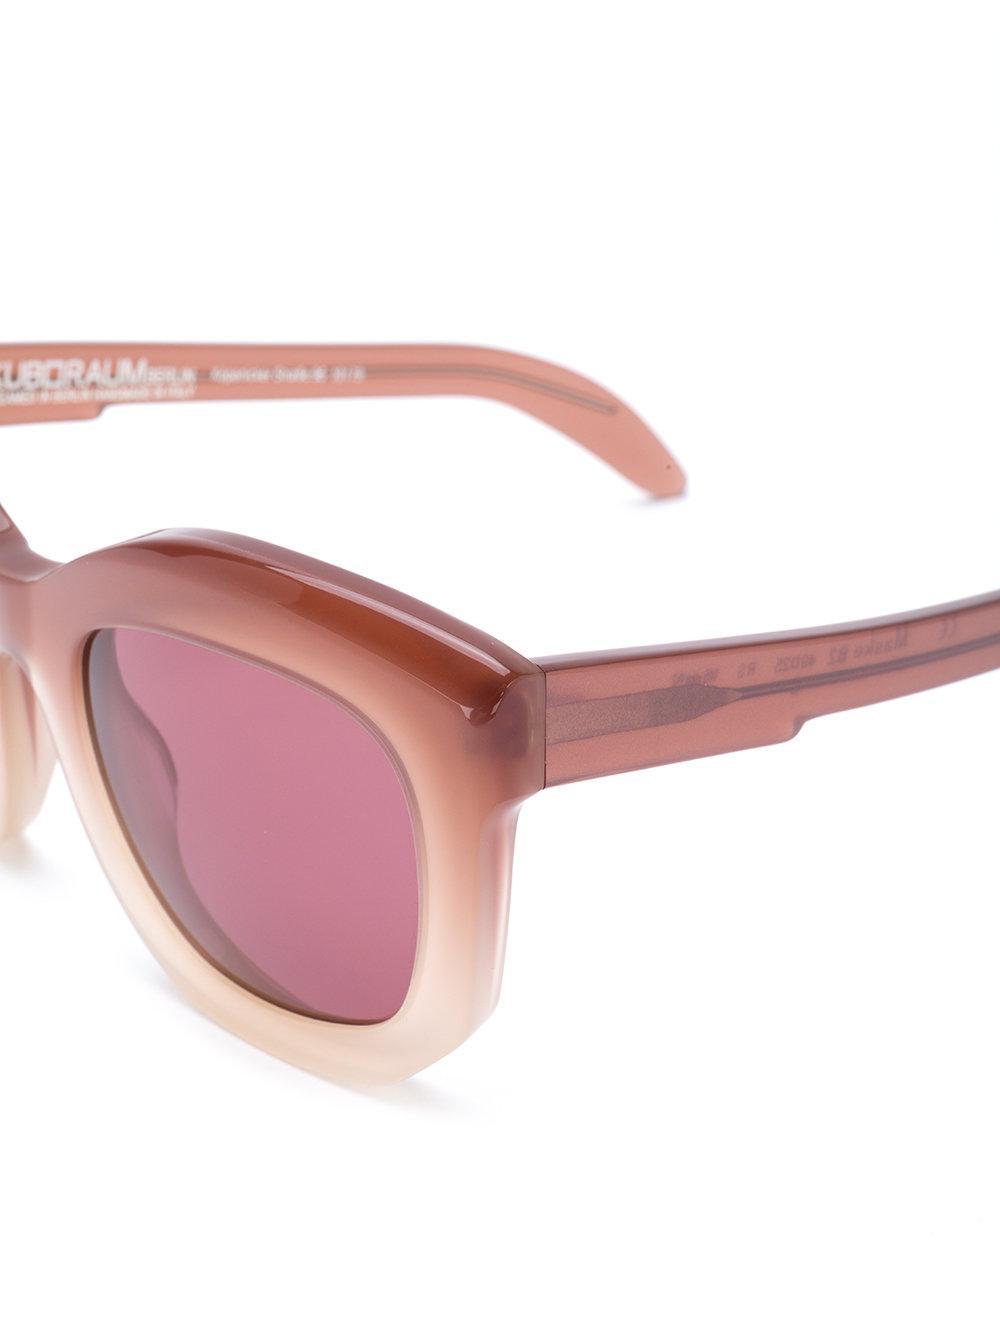 Kuboraum B2 Sunglasses in Pink & Purple (Pink)